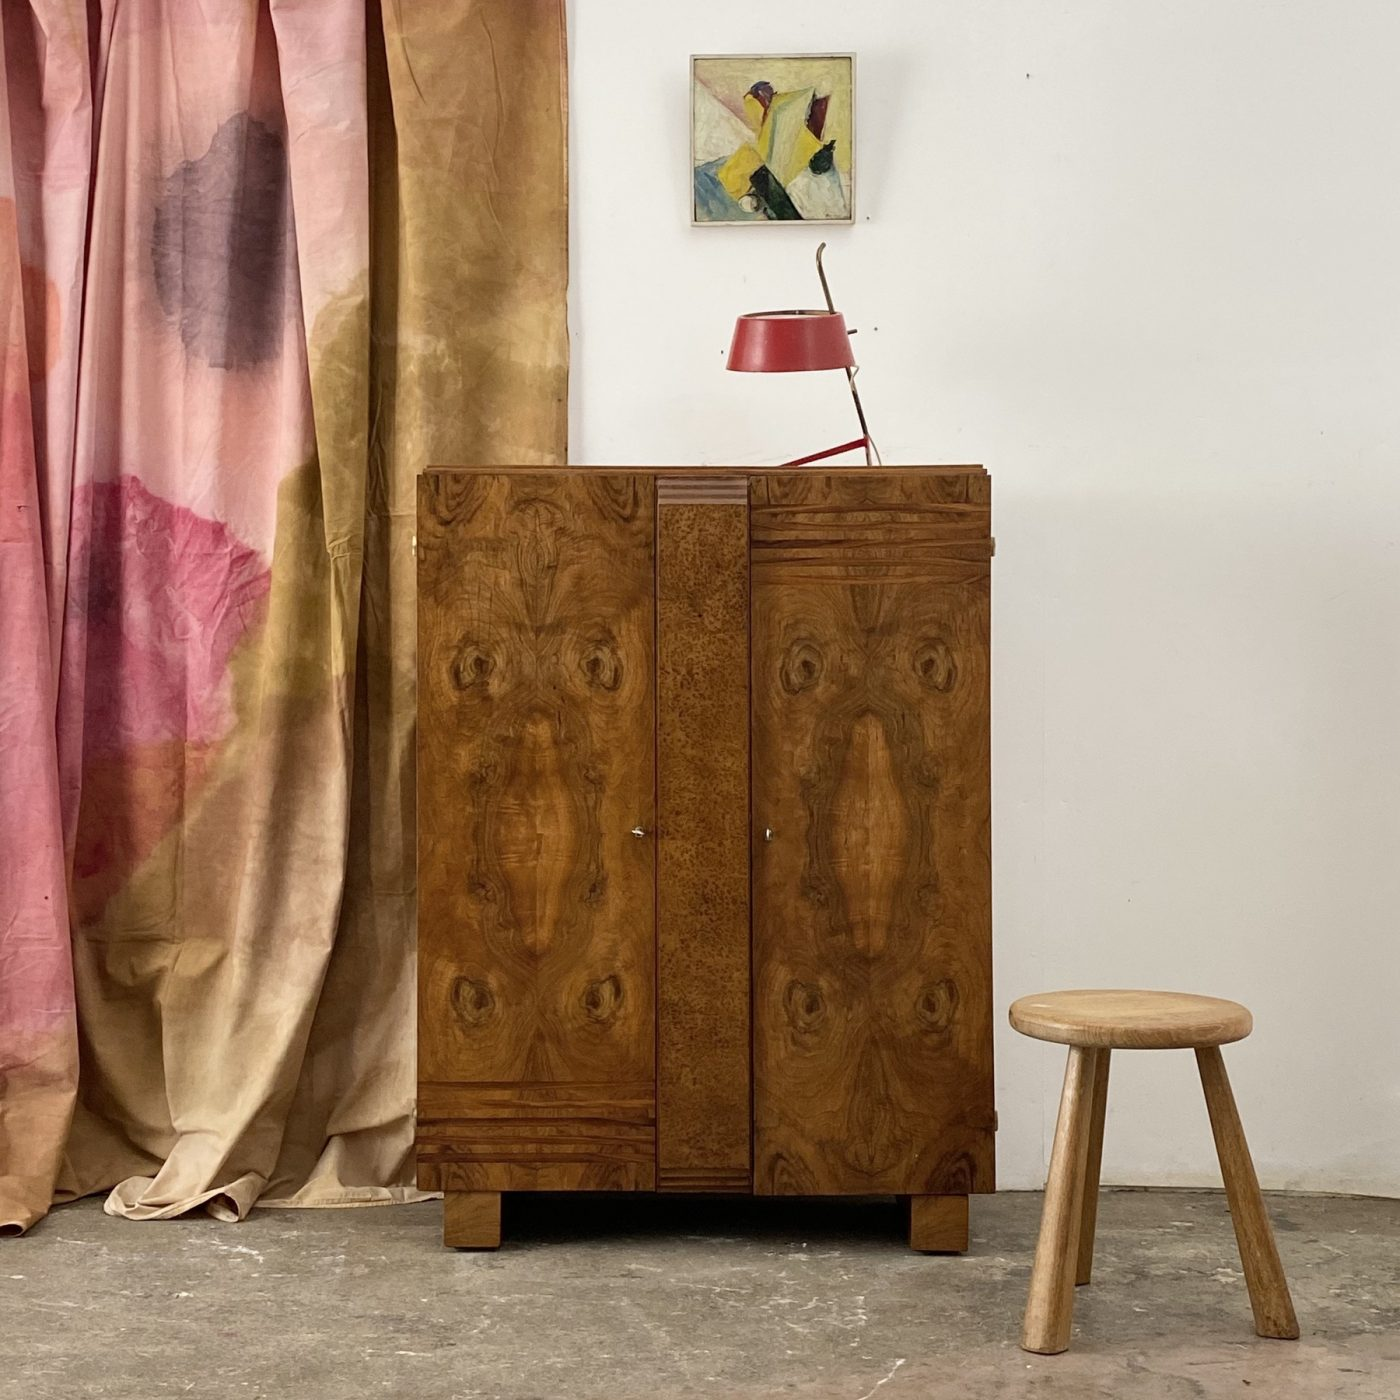 objet-vagabond-artdeco-cabinet0003